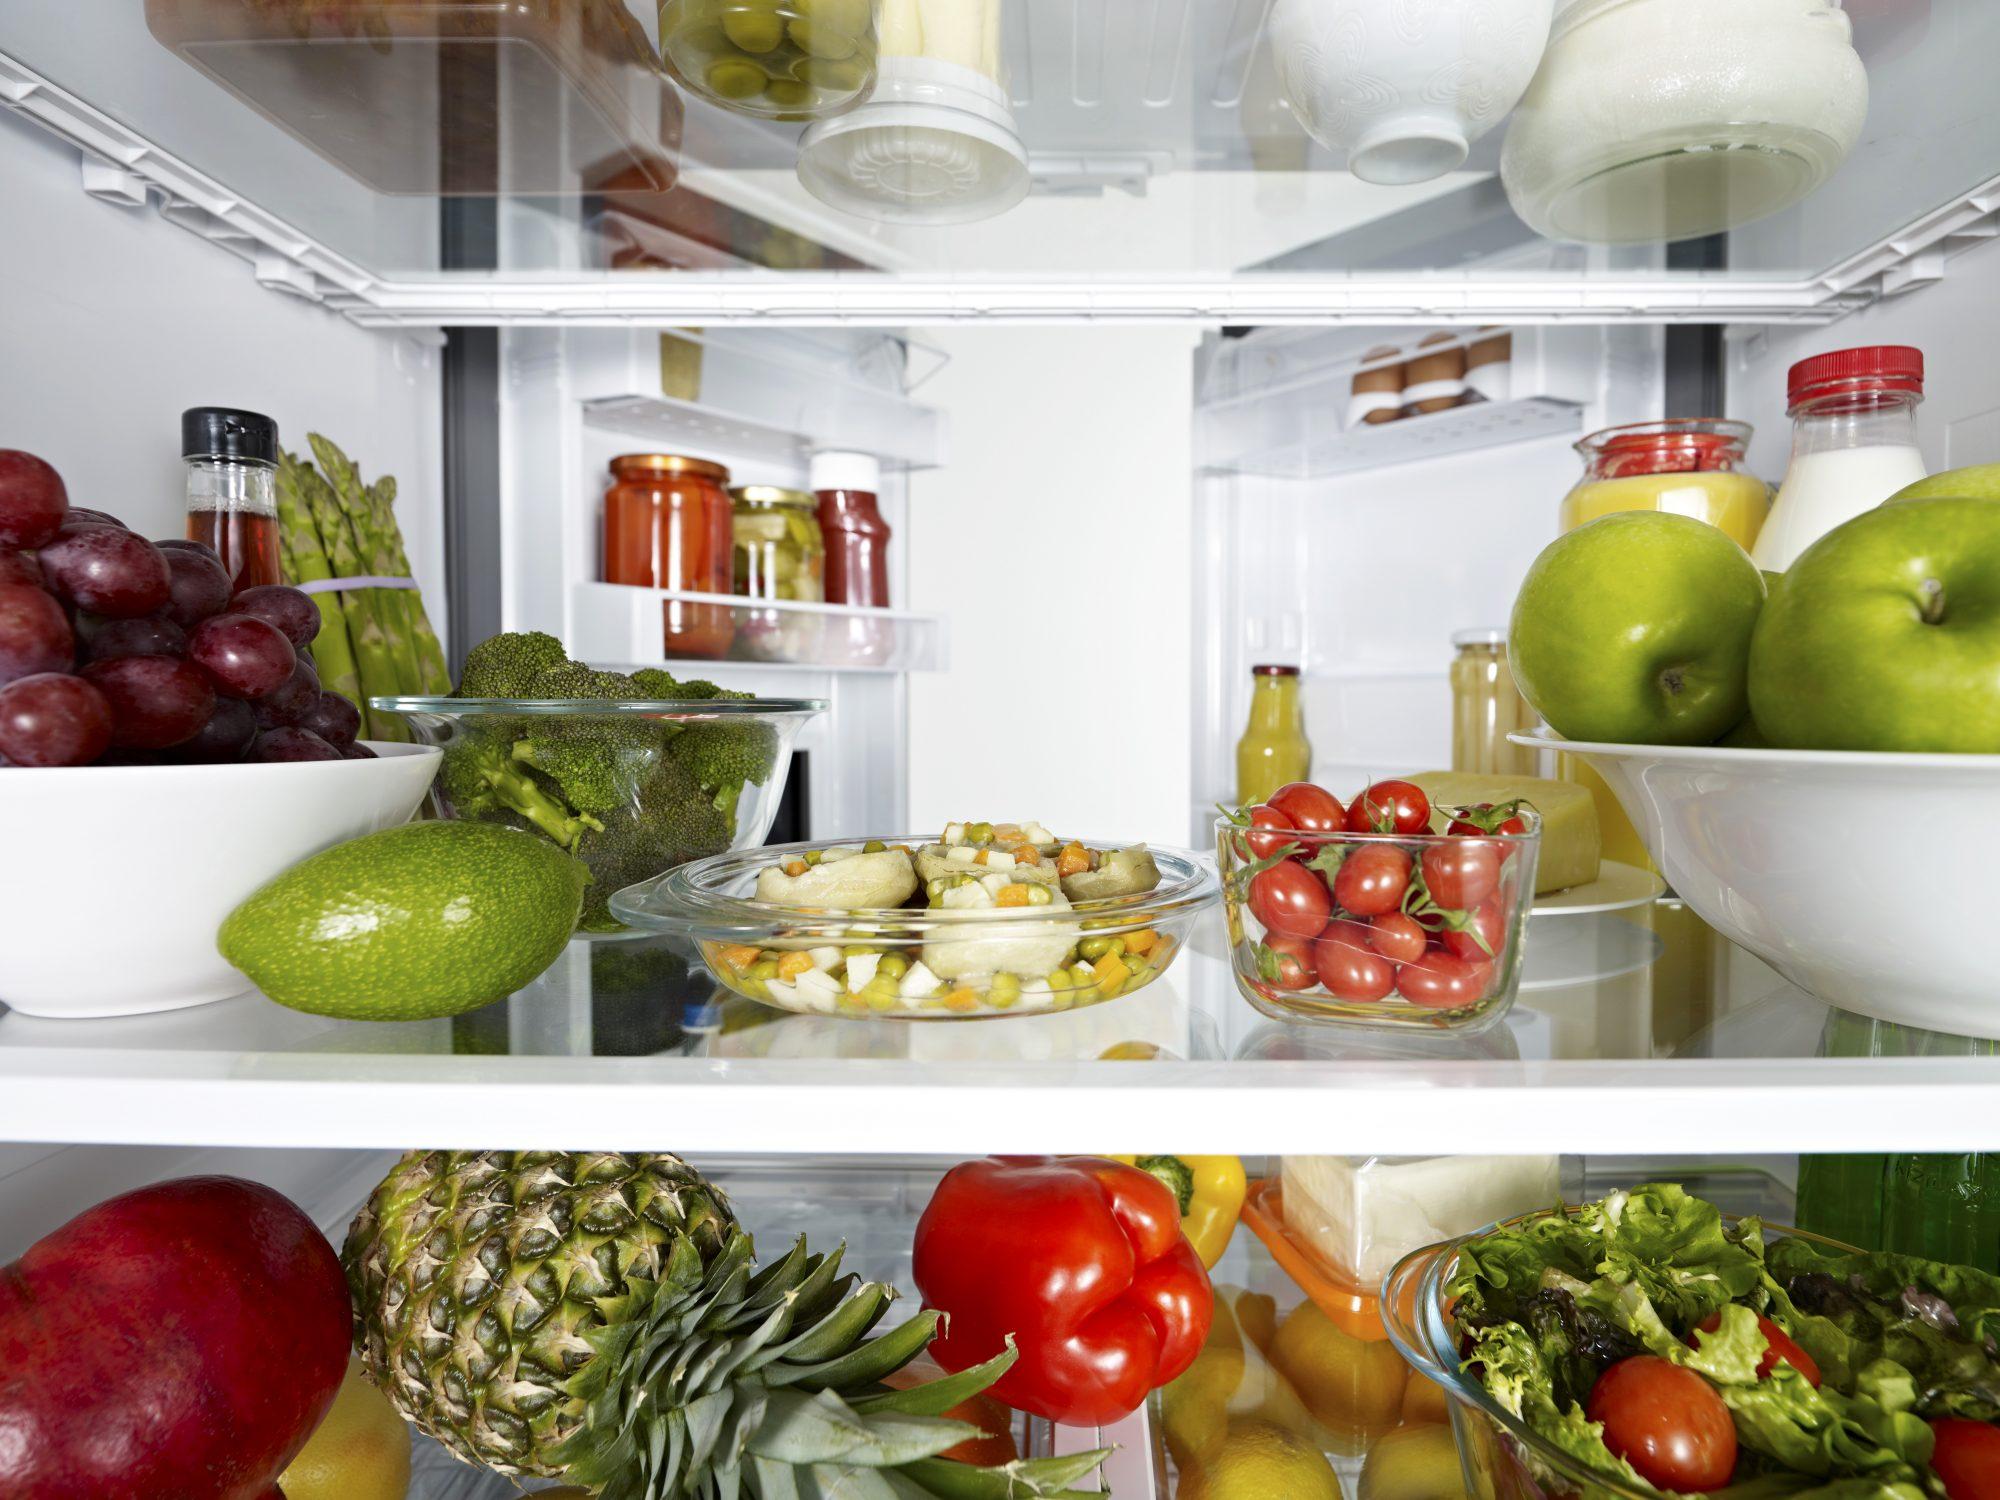 food-waste-mistakes: inside refrigerator